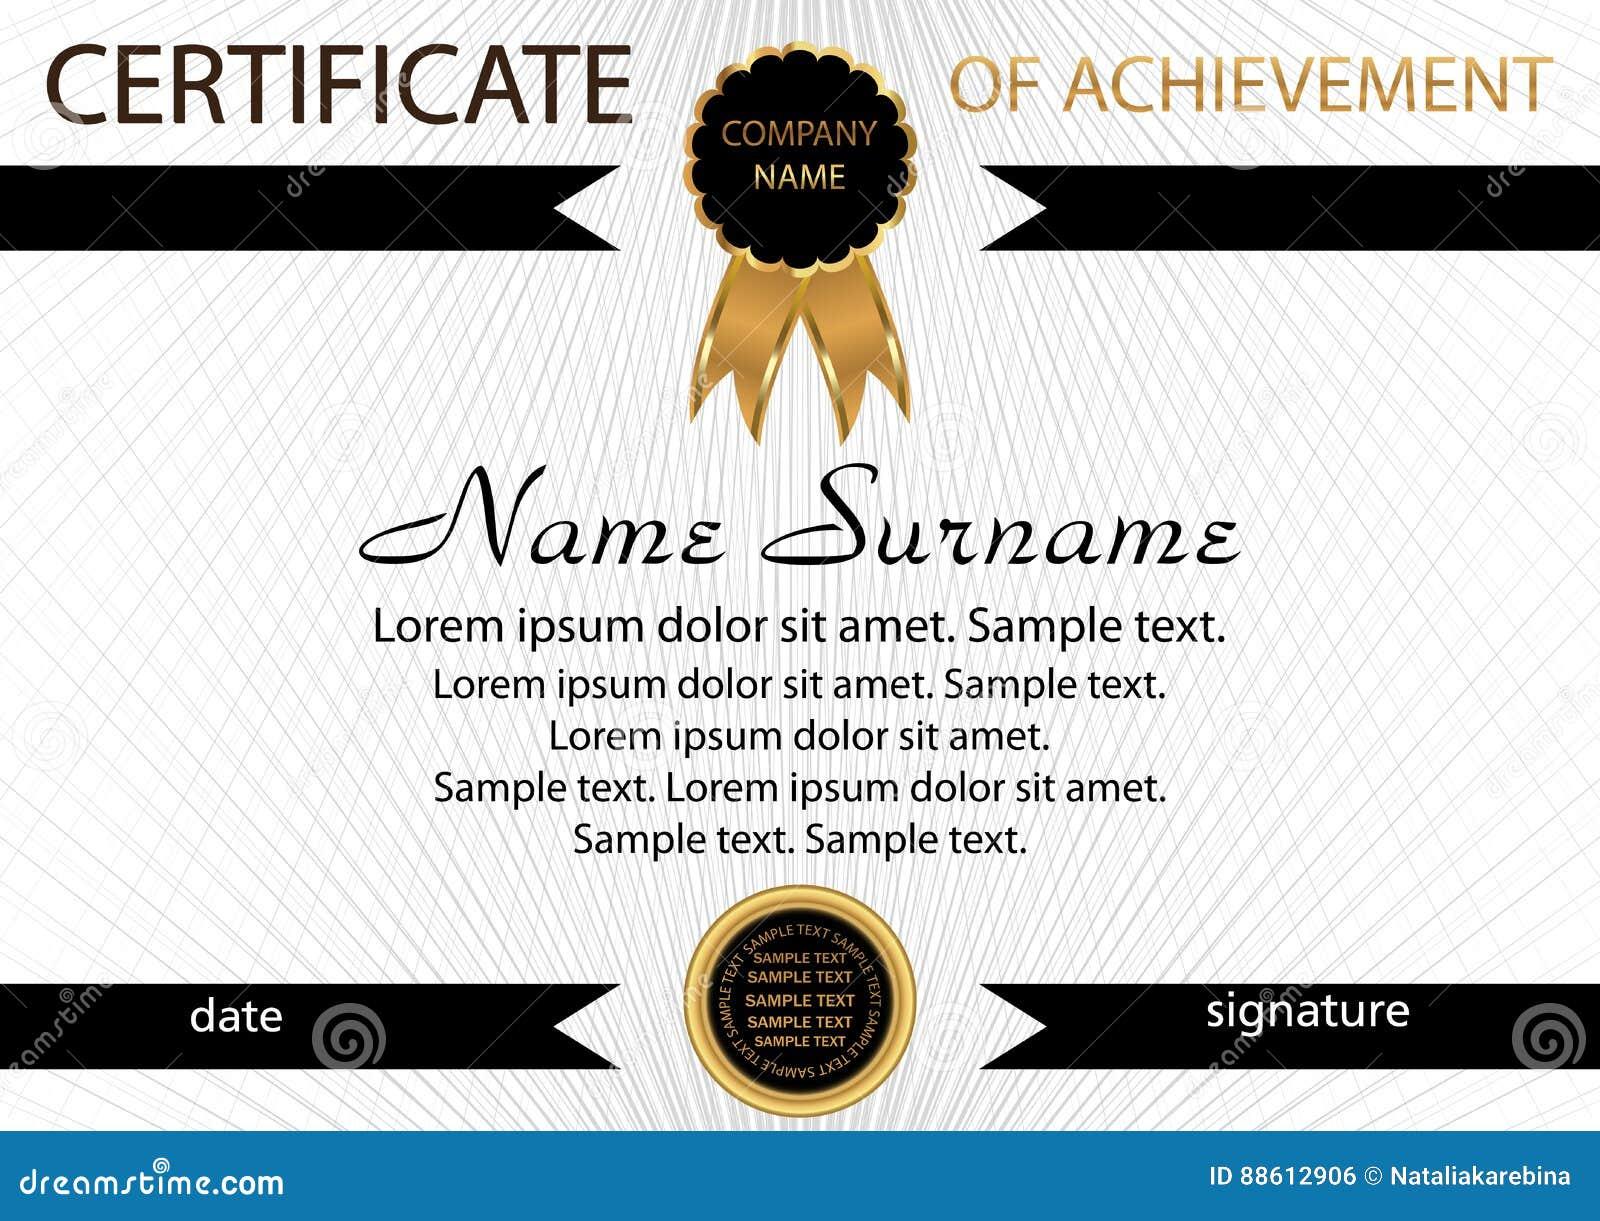 Achievement Certificate Templates